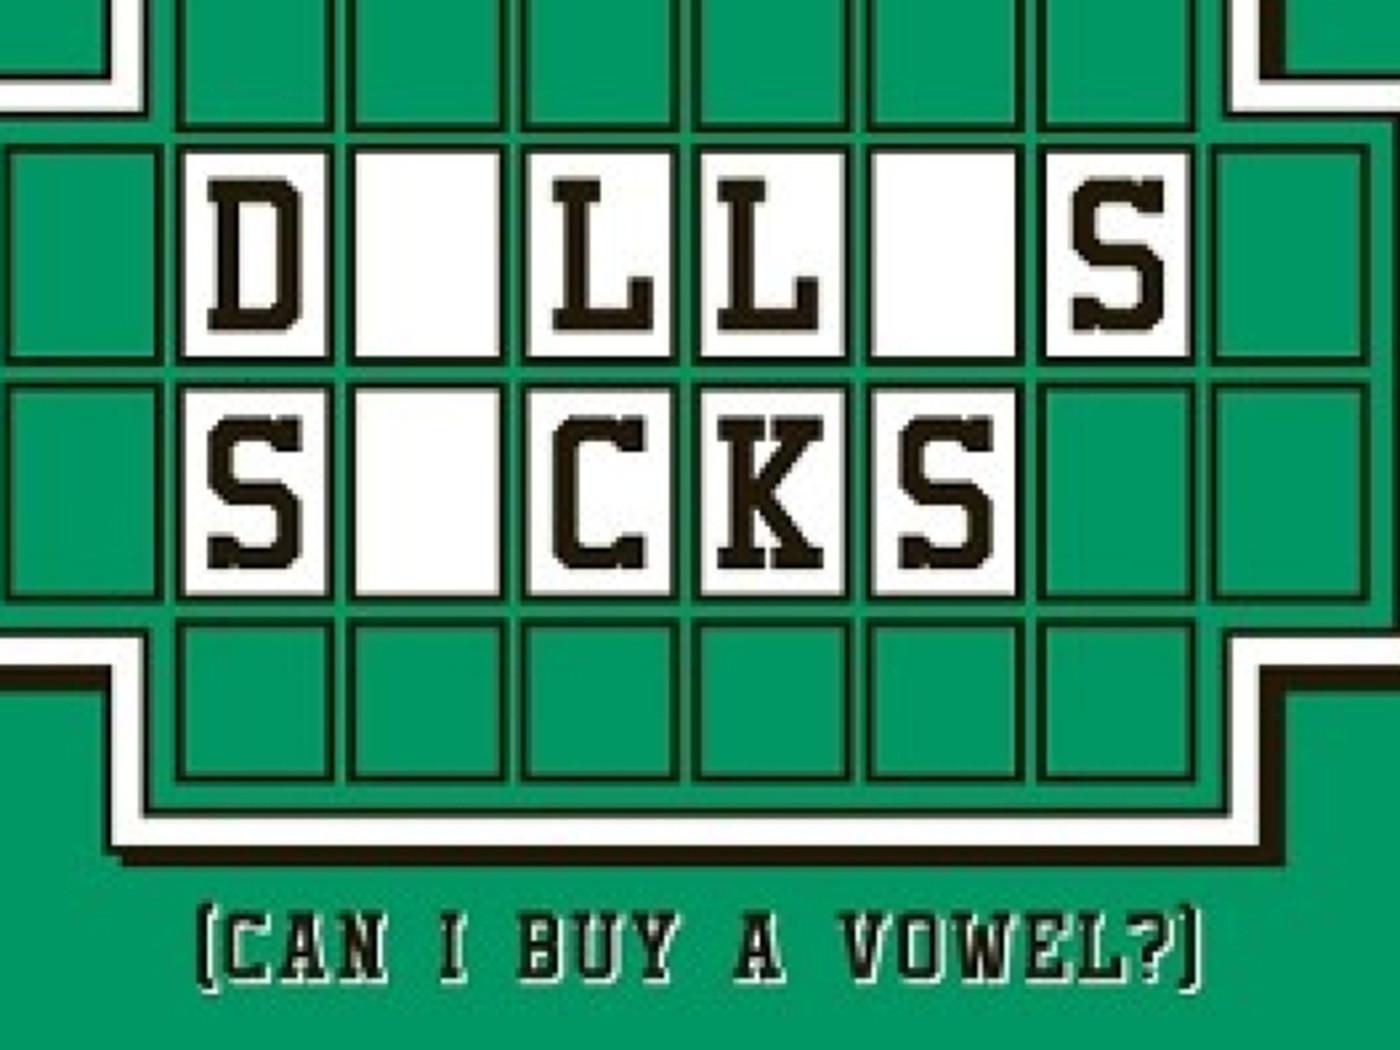 0a7dae477 Philadelphia eagles fans can prepare for dallas week buying an anti cowboys  shirt bleeding green nation